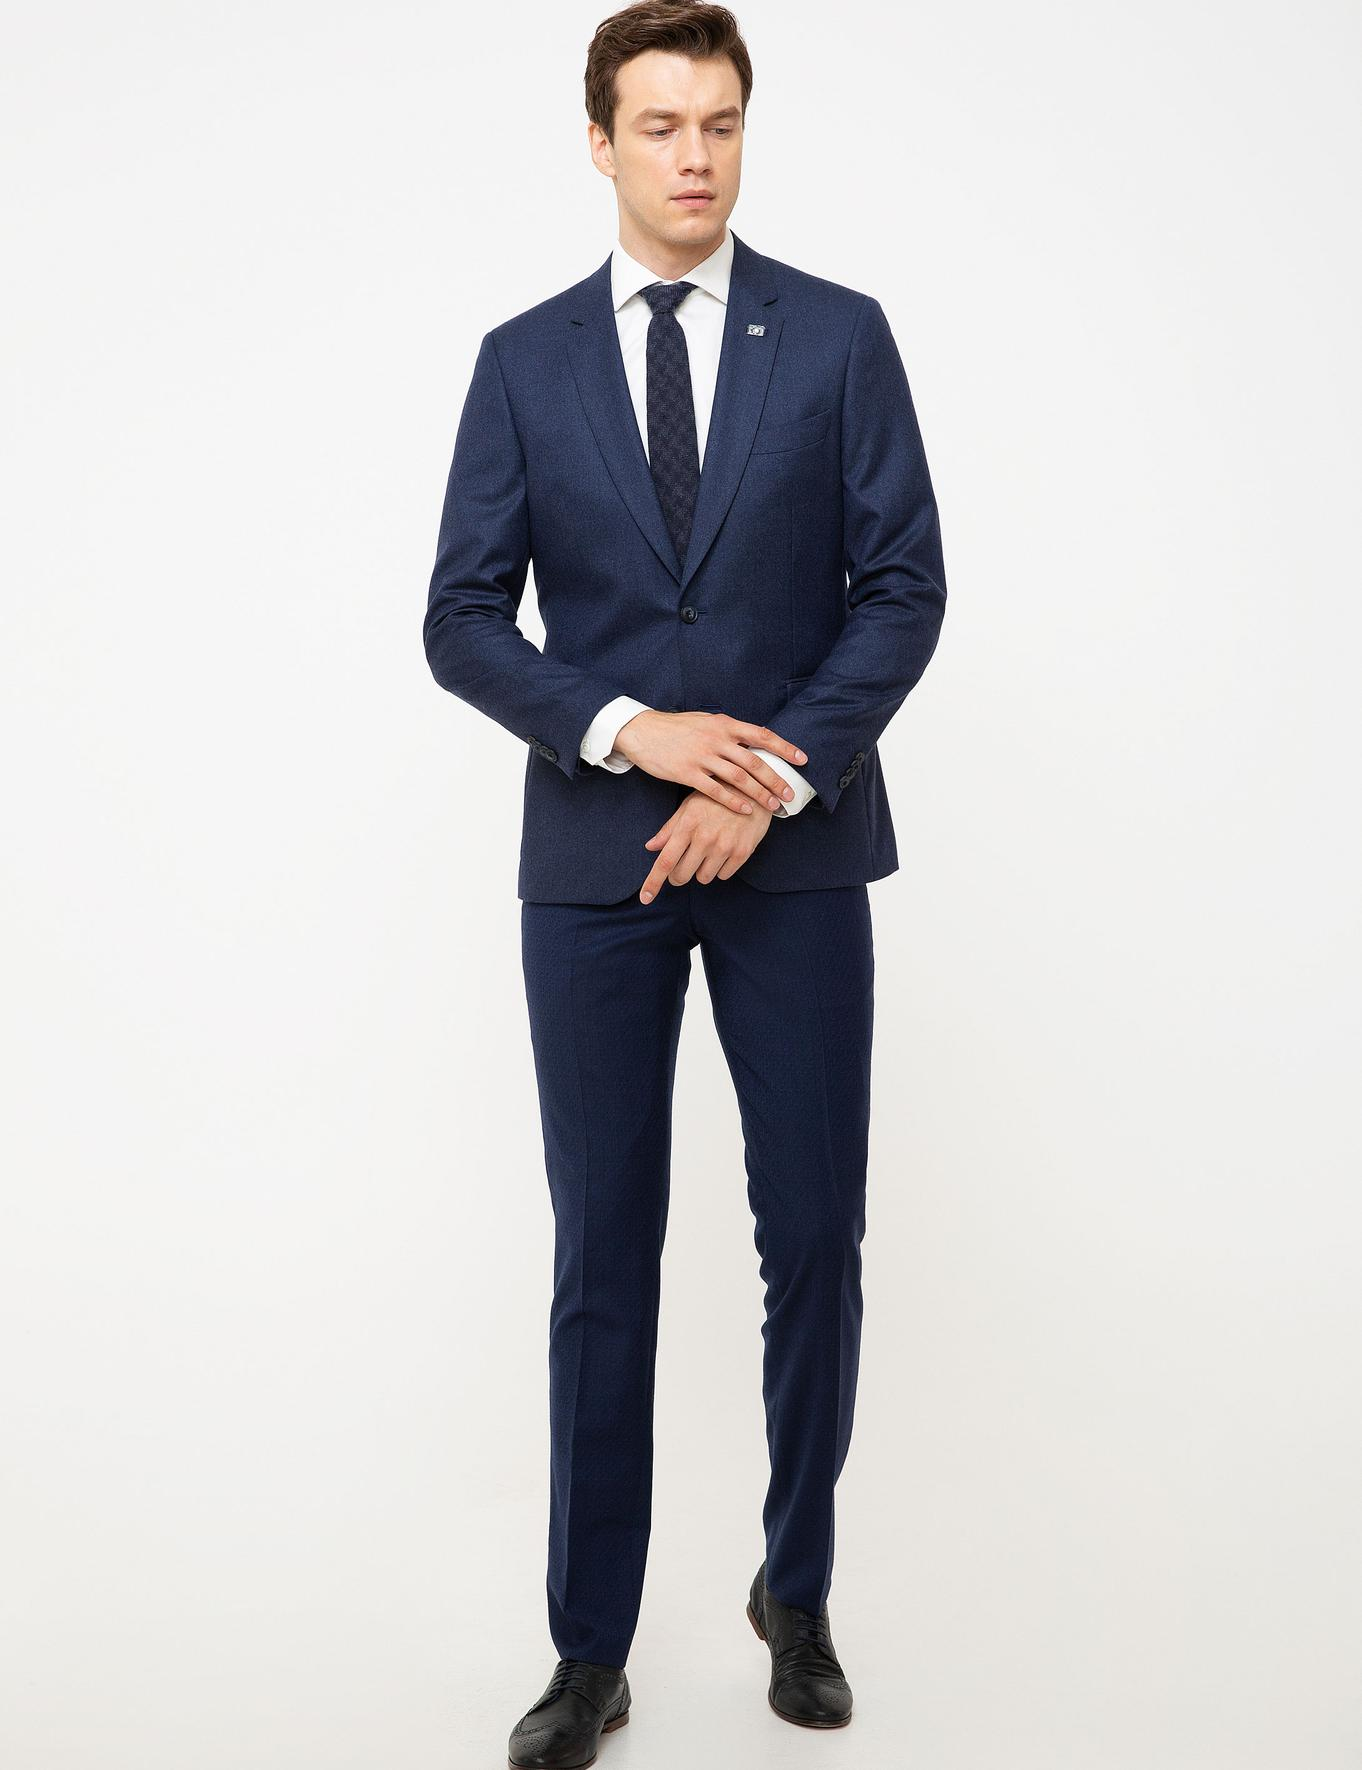 Mavi Slim Fit Ceket - 50192737035